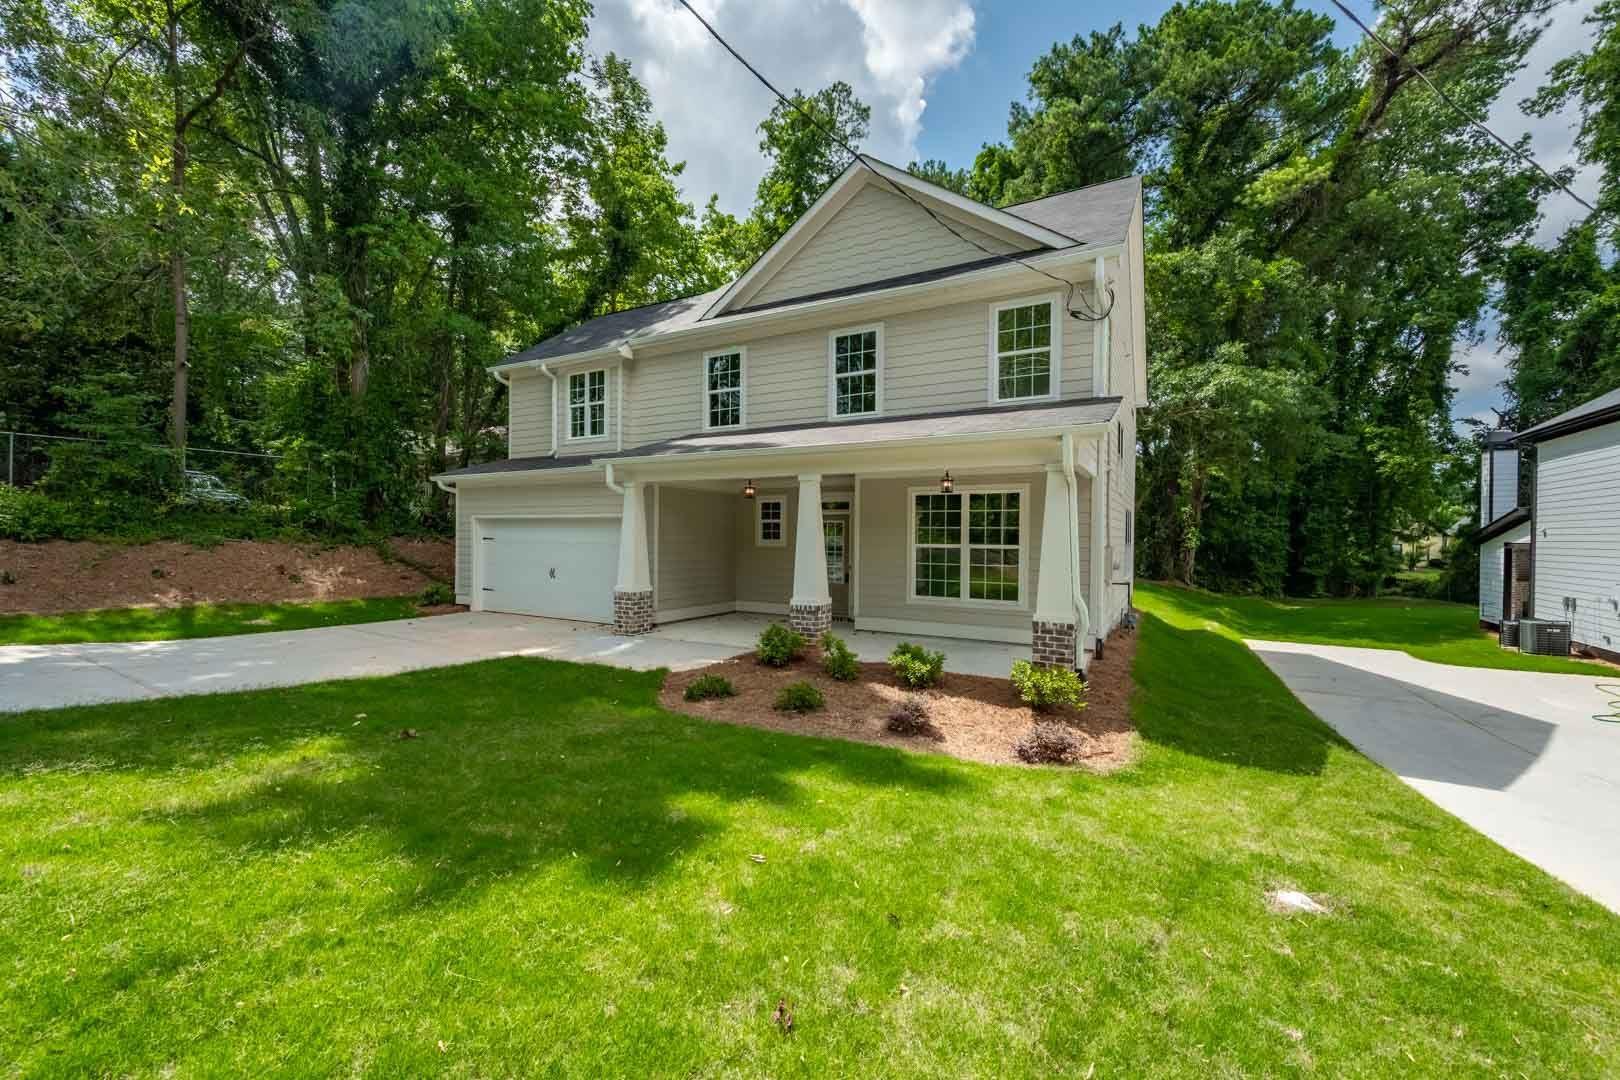 1487 Eastland Rd, Atlanta, GA 30316 - MLS#: 8715306